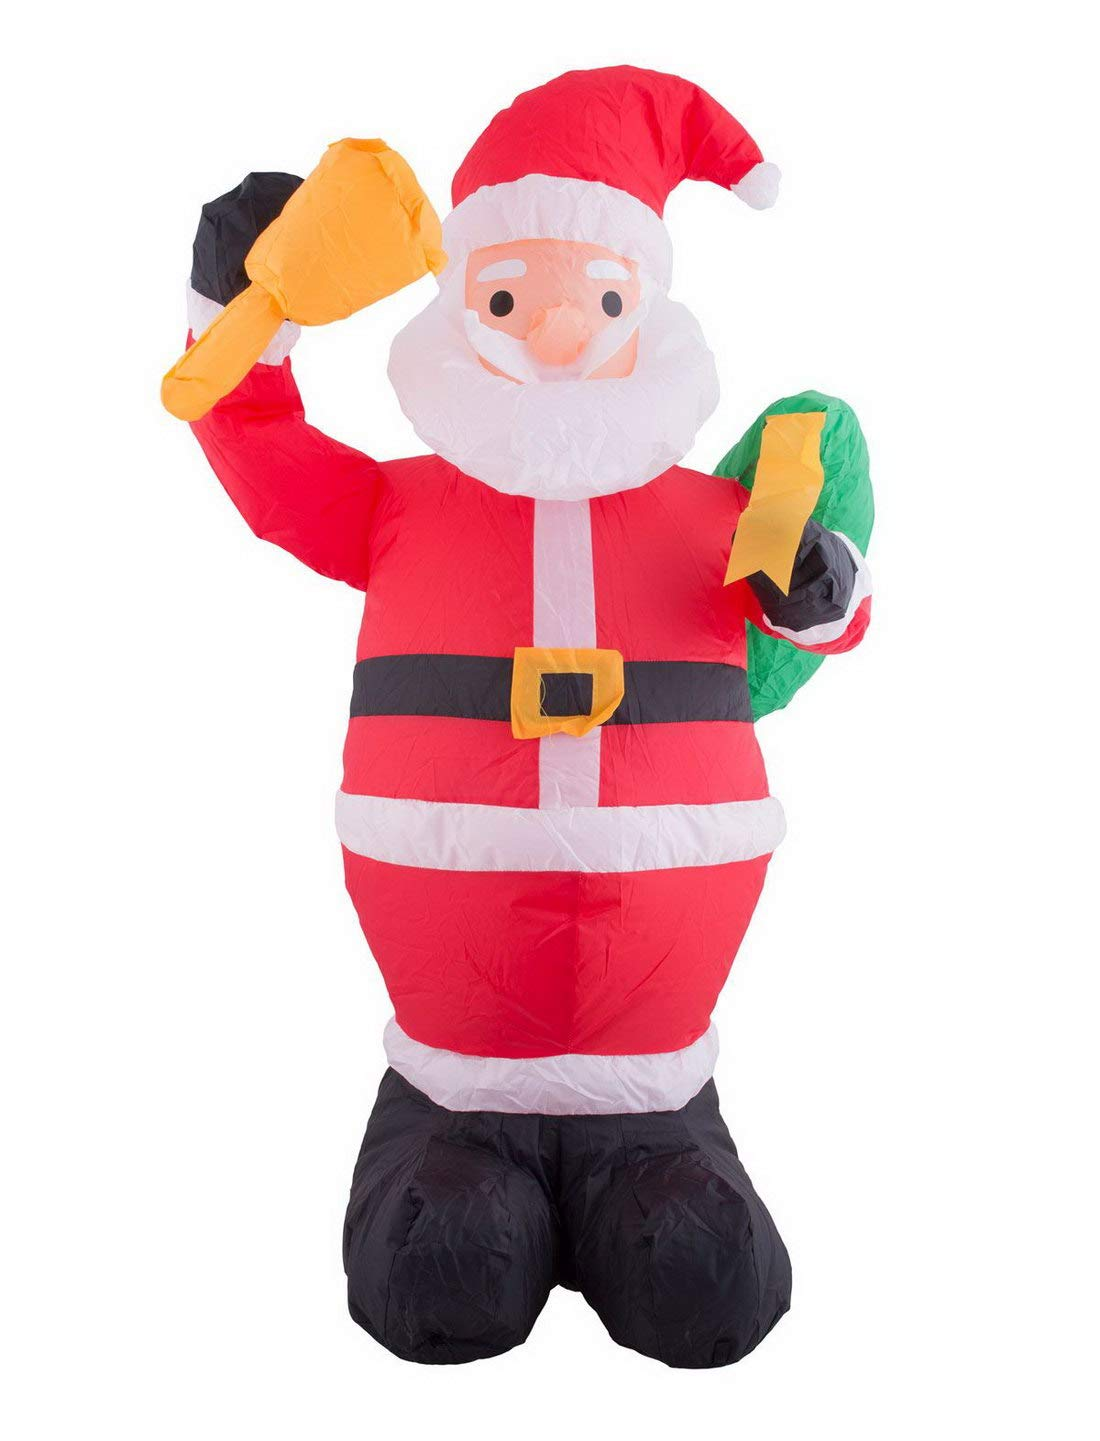 toybakery - Decoración navideña Decorativa Hinchable Papá ...